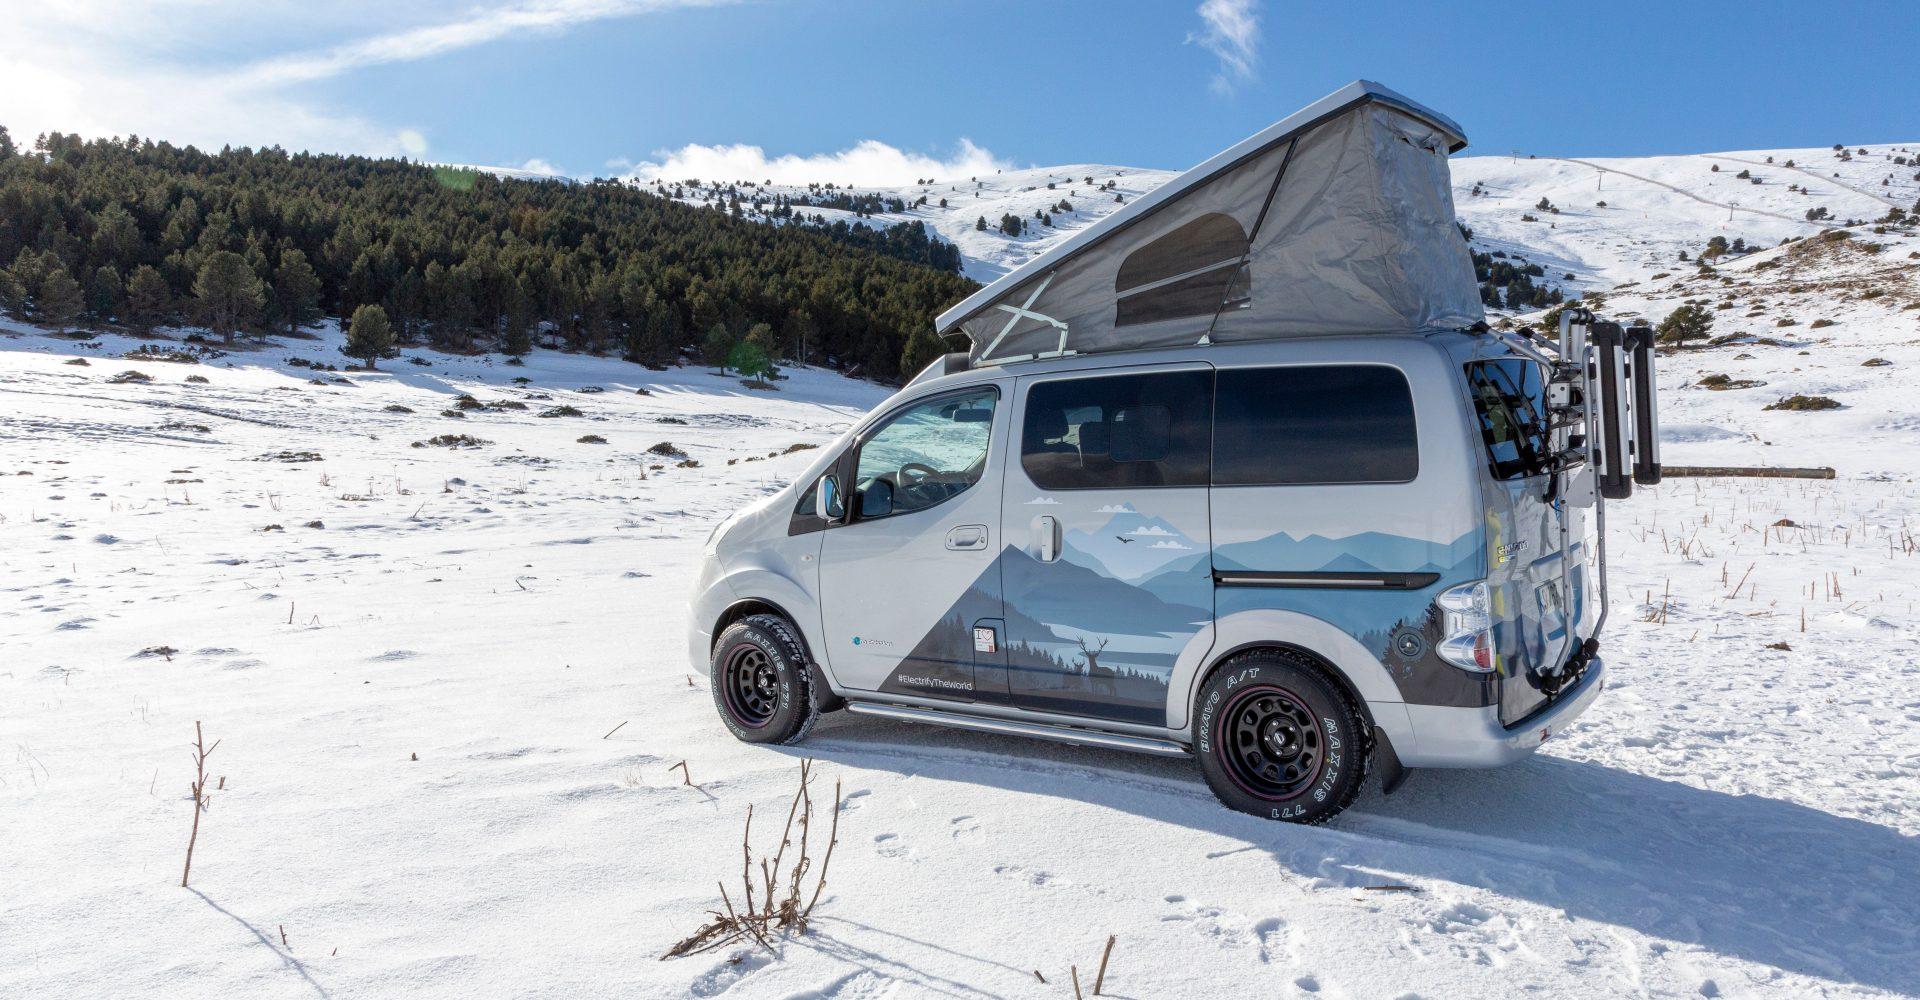 Nissan e-NV200 Winter Camper concept is the perfect zero-emission adventure vehicle